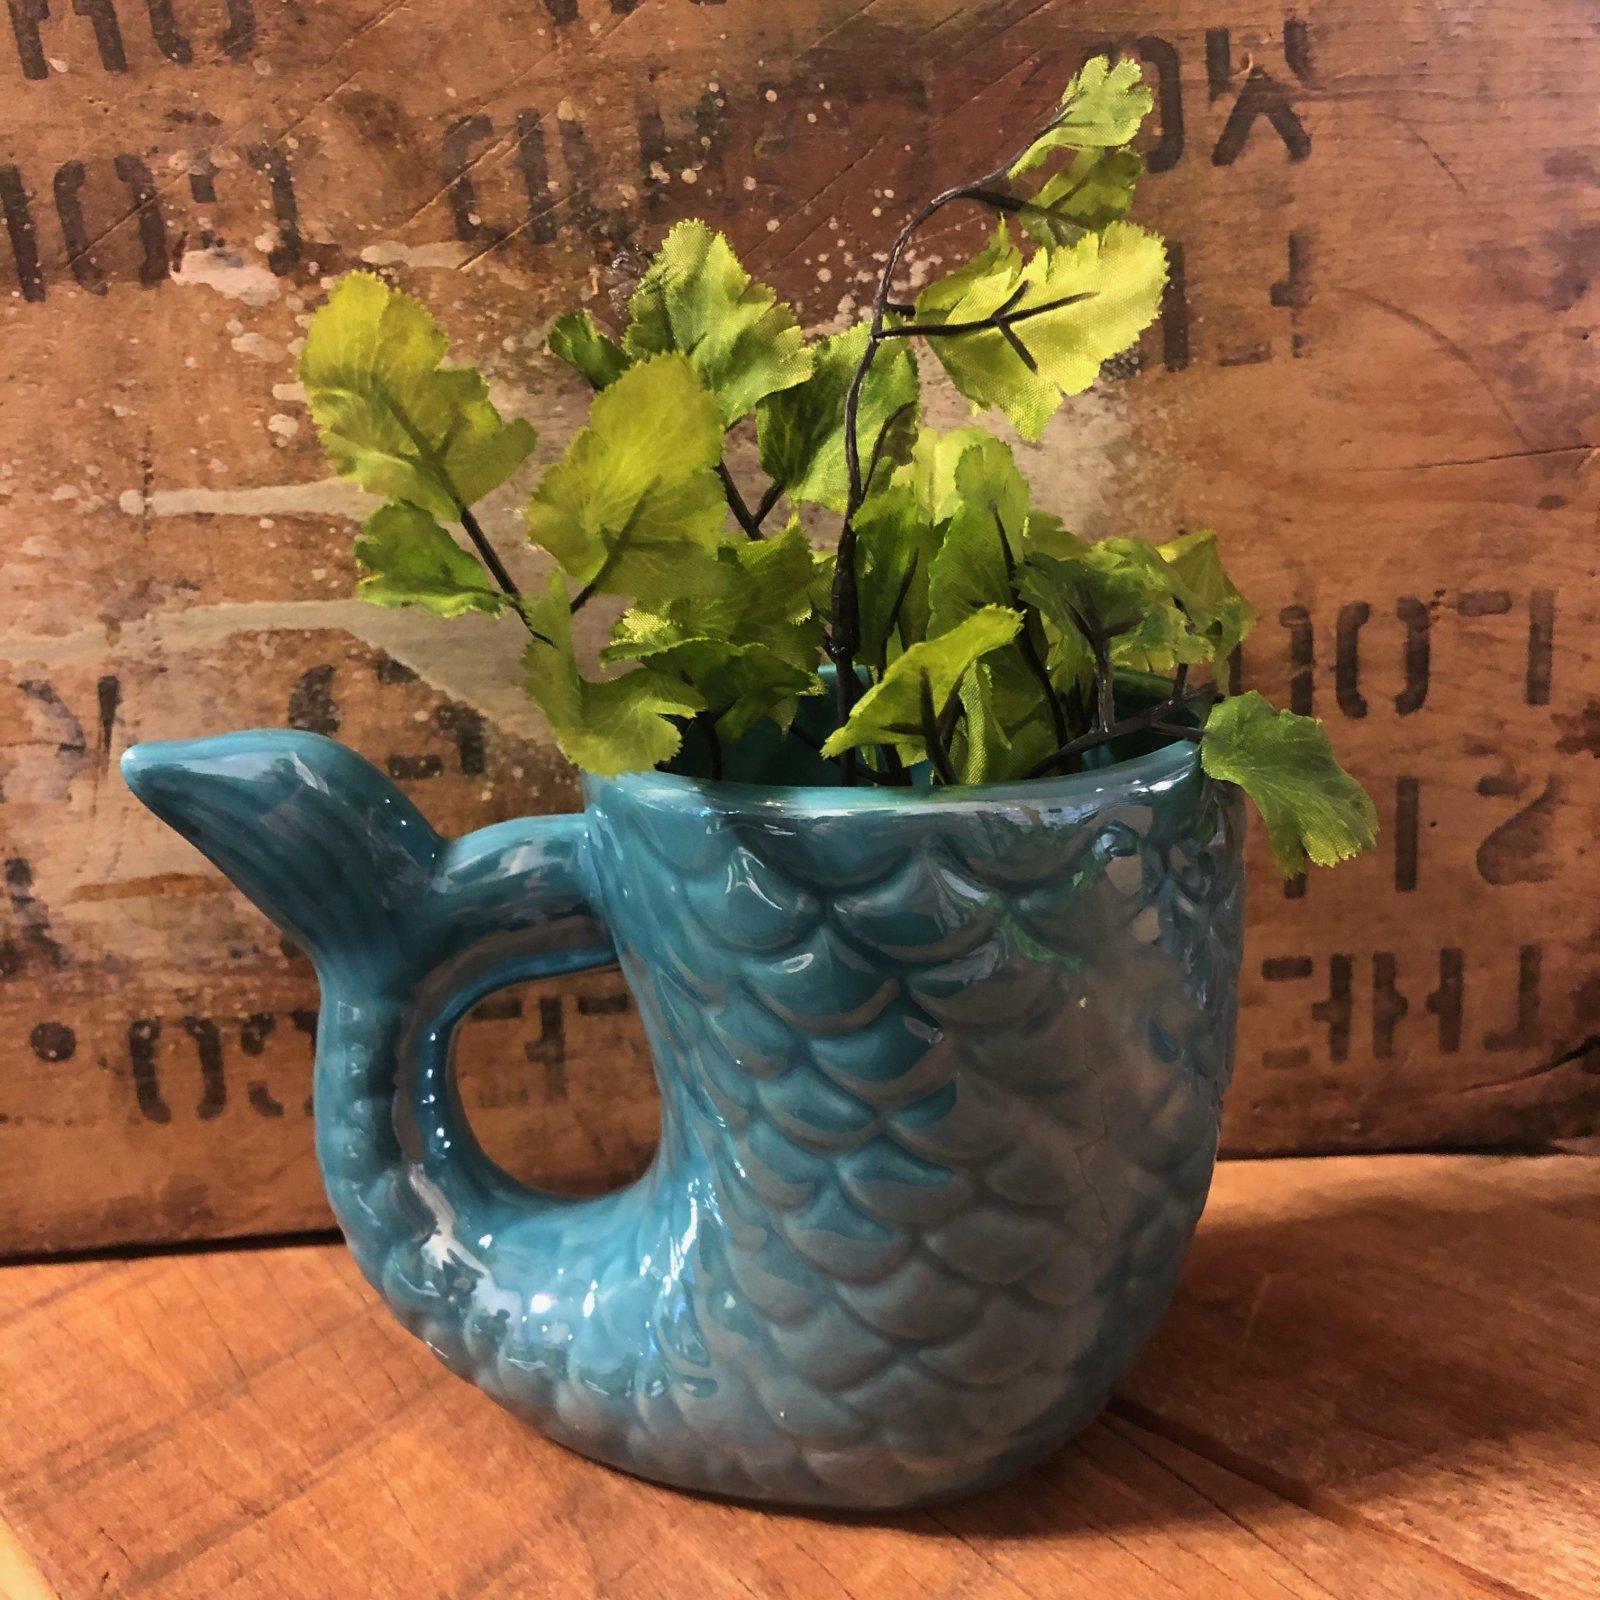 STR Mermaid Tail Mug/Planter